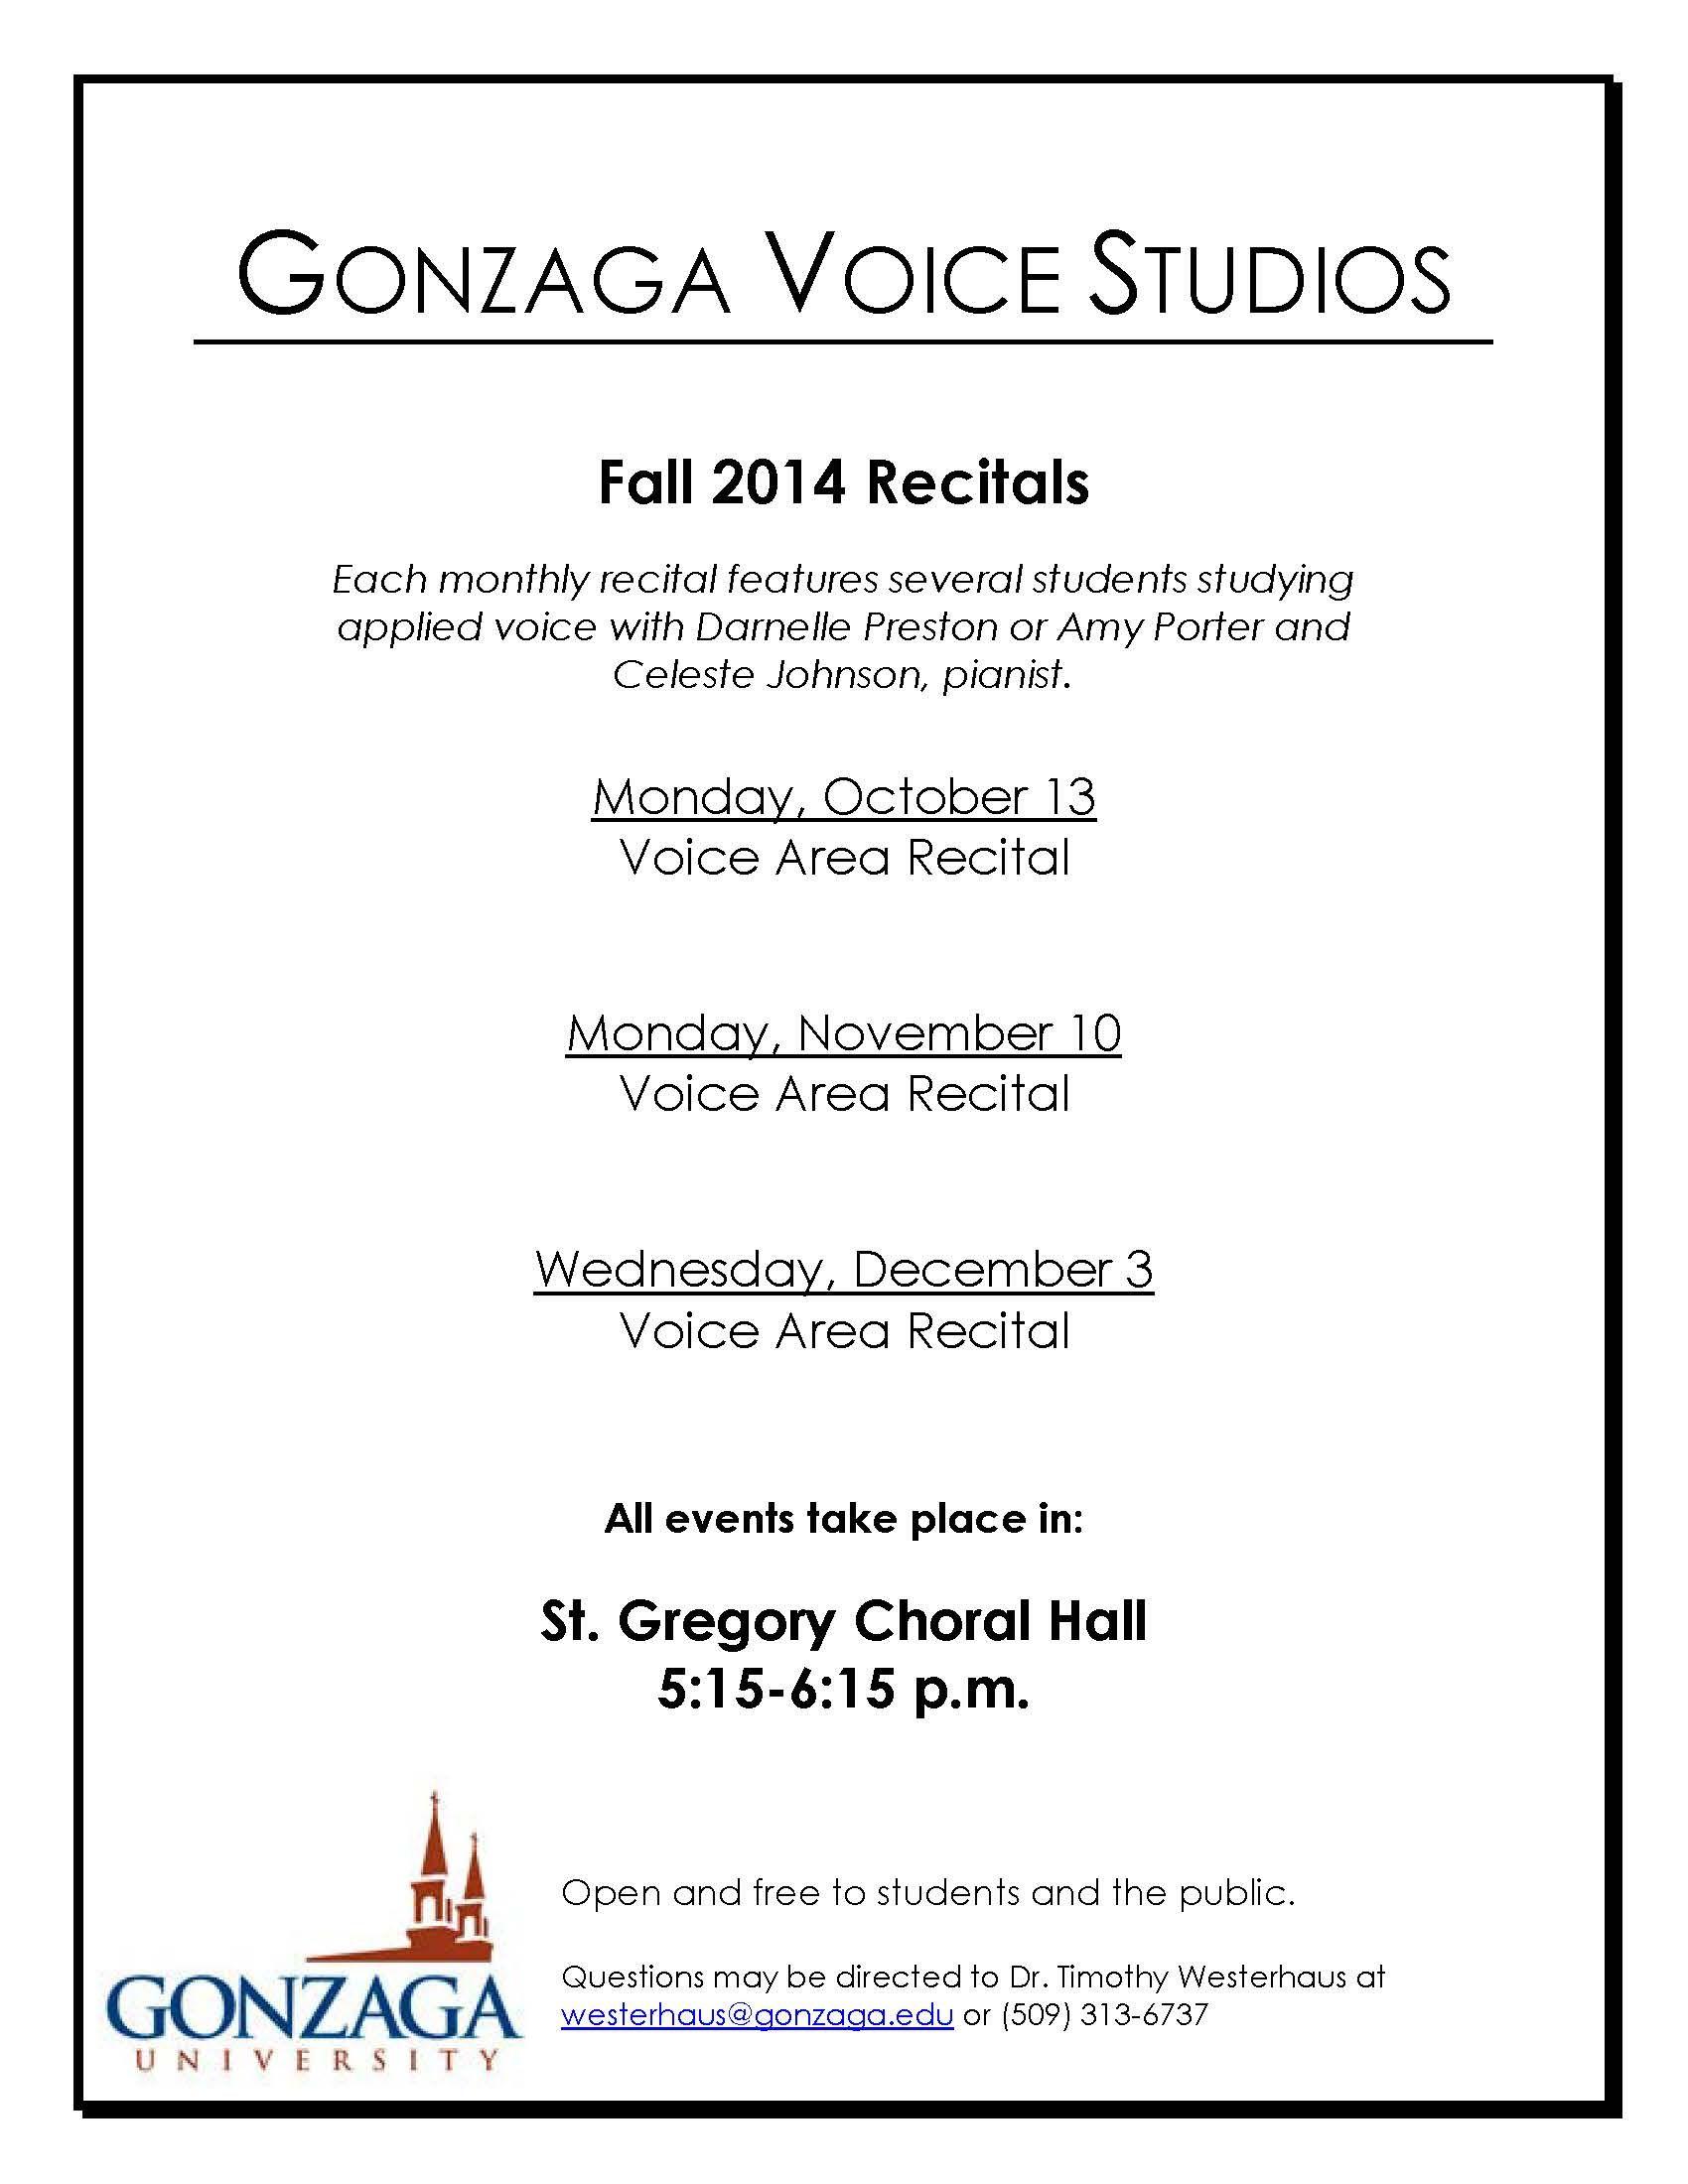 Voice Recitals this Fall Semester